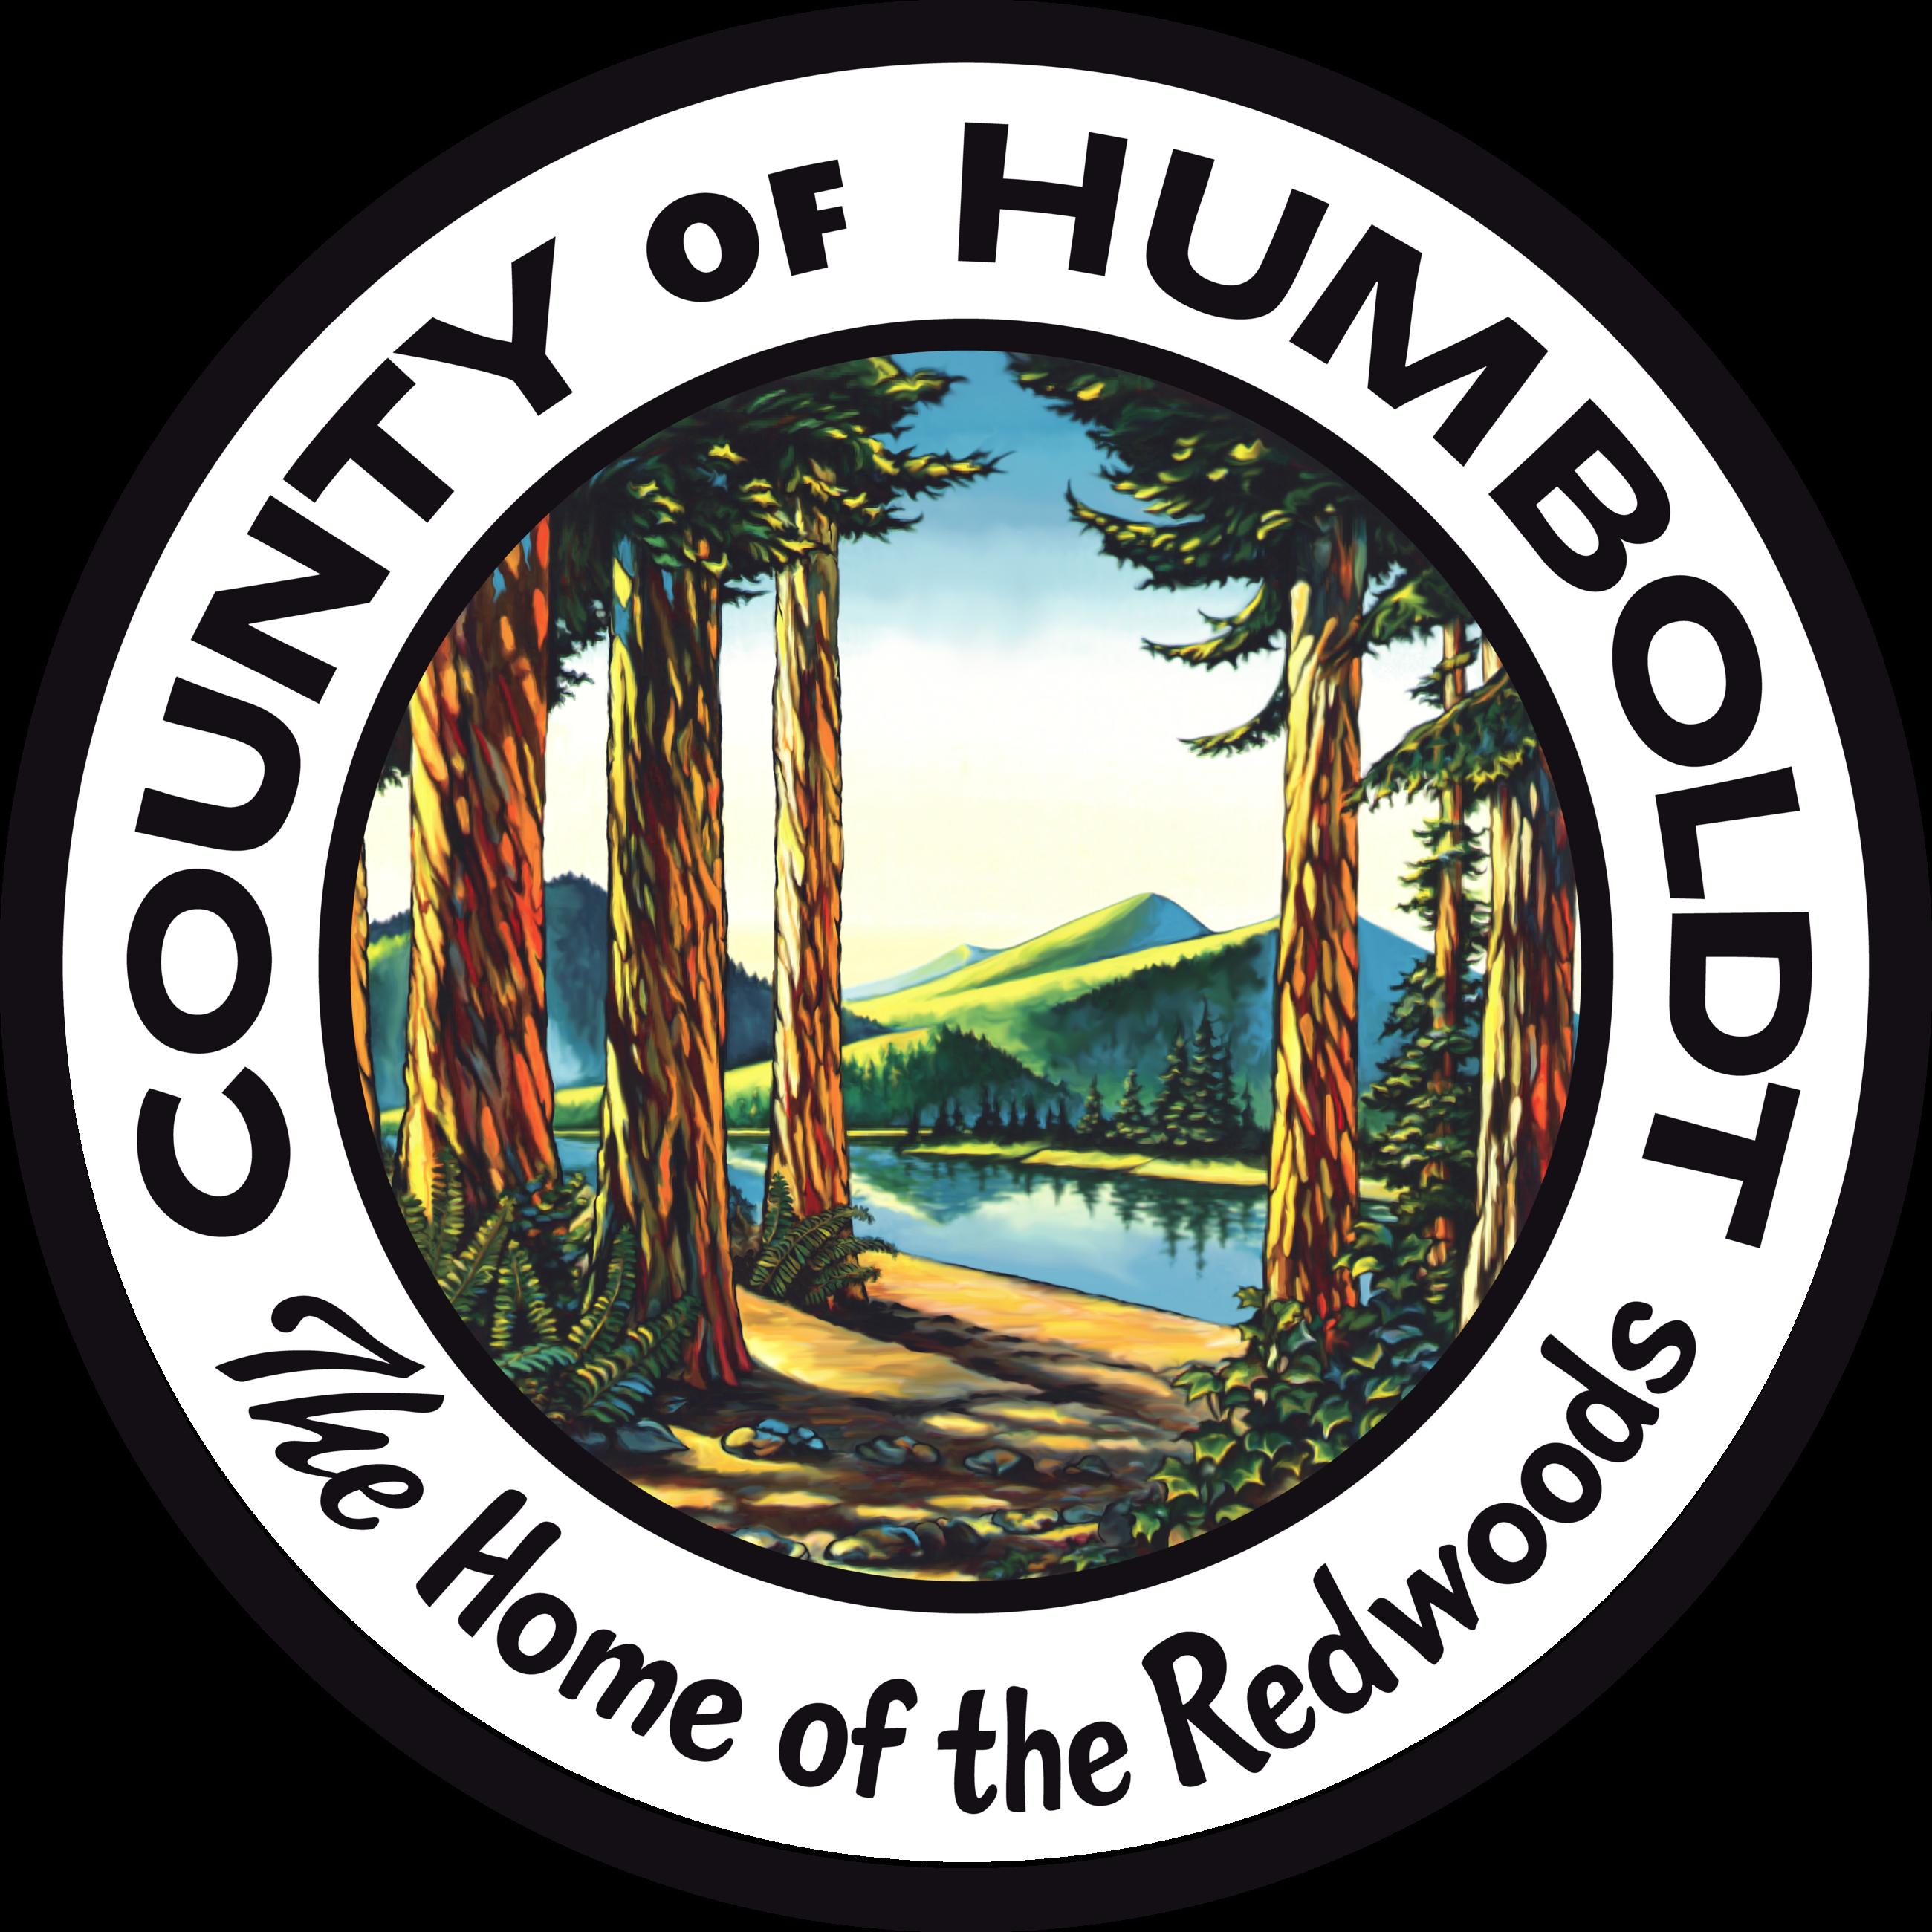 humboldt county ca official website